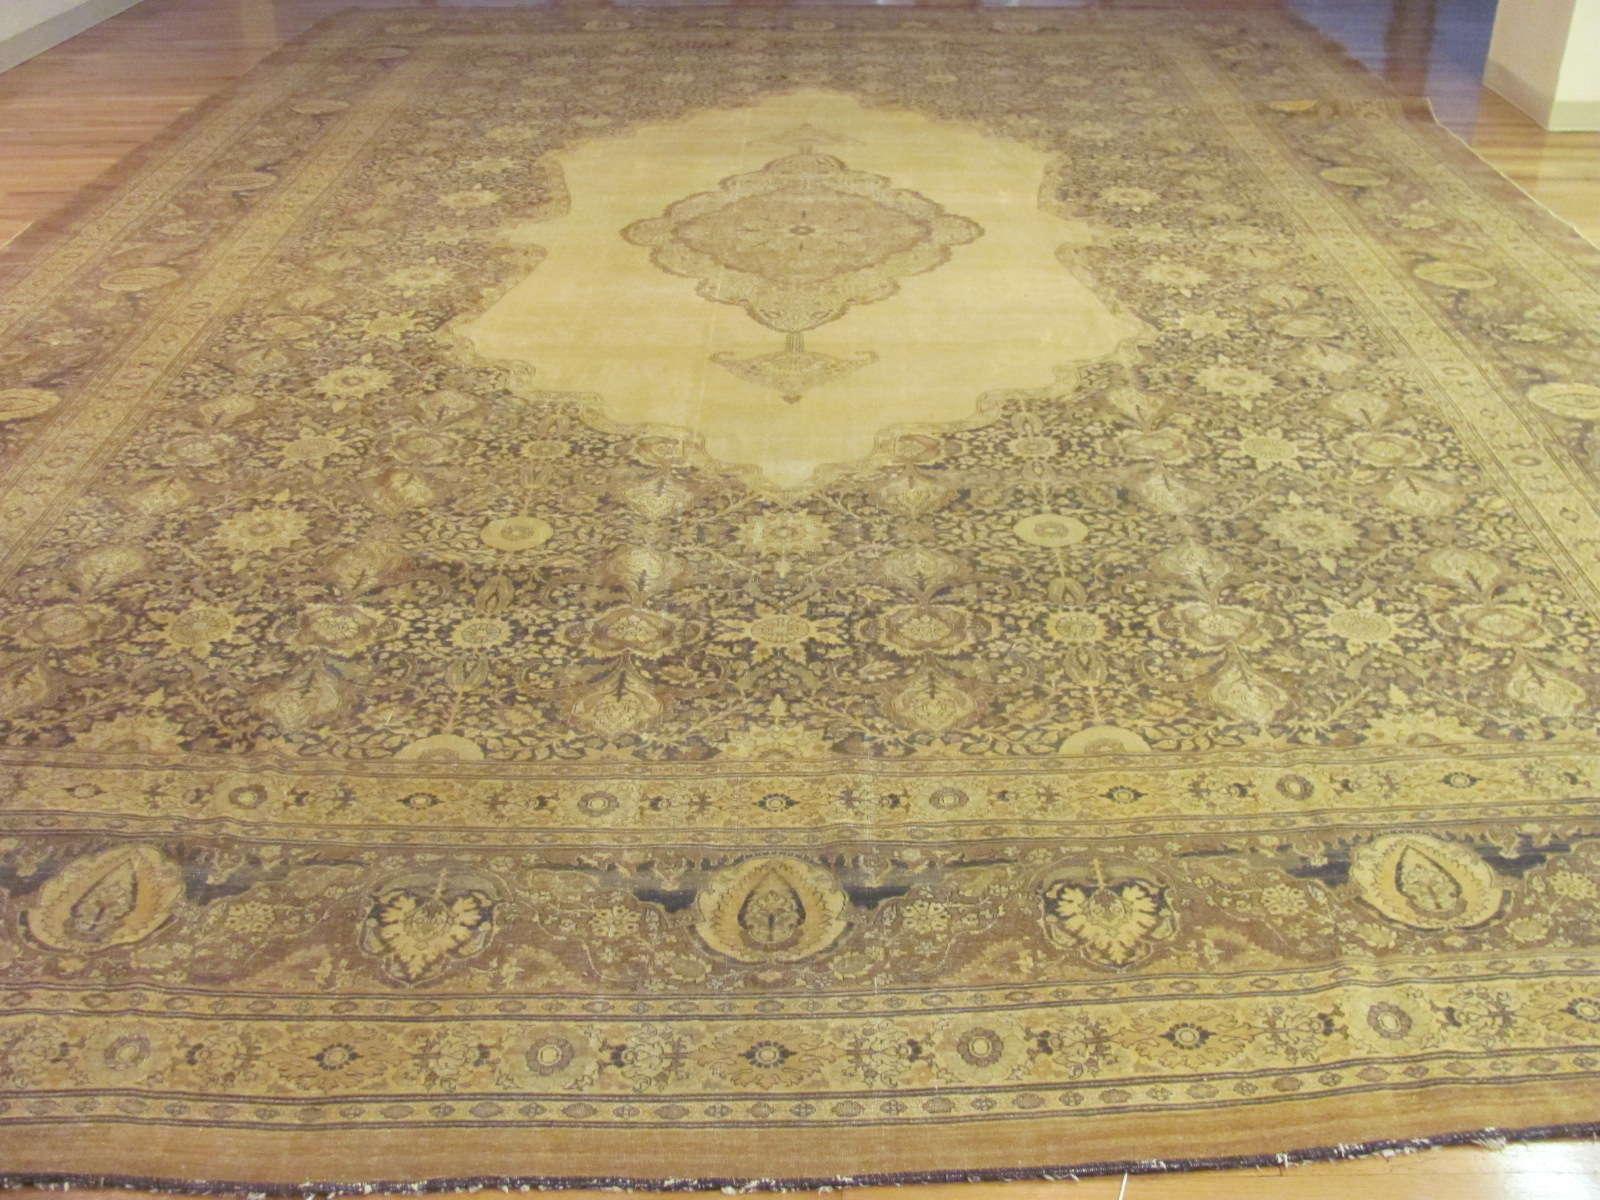 Tabriz Haj Jalili Rug | Persia | Antique | Handmade, Circa 1900